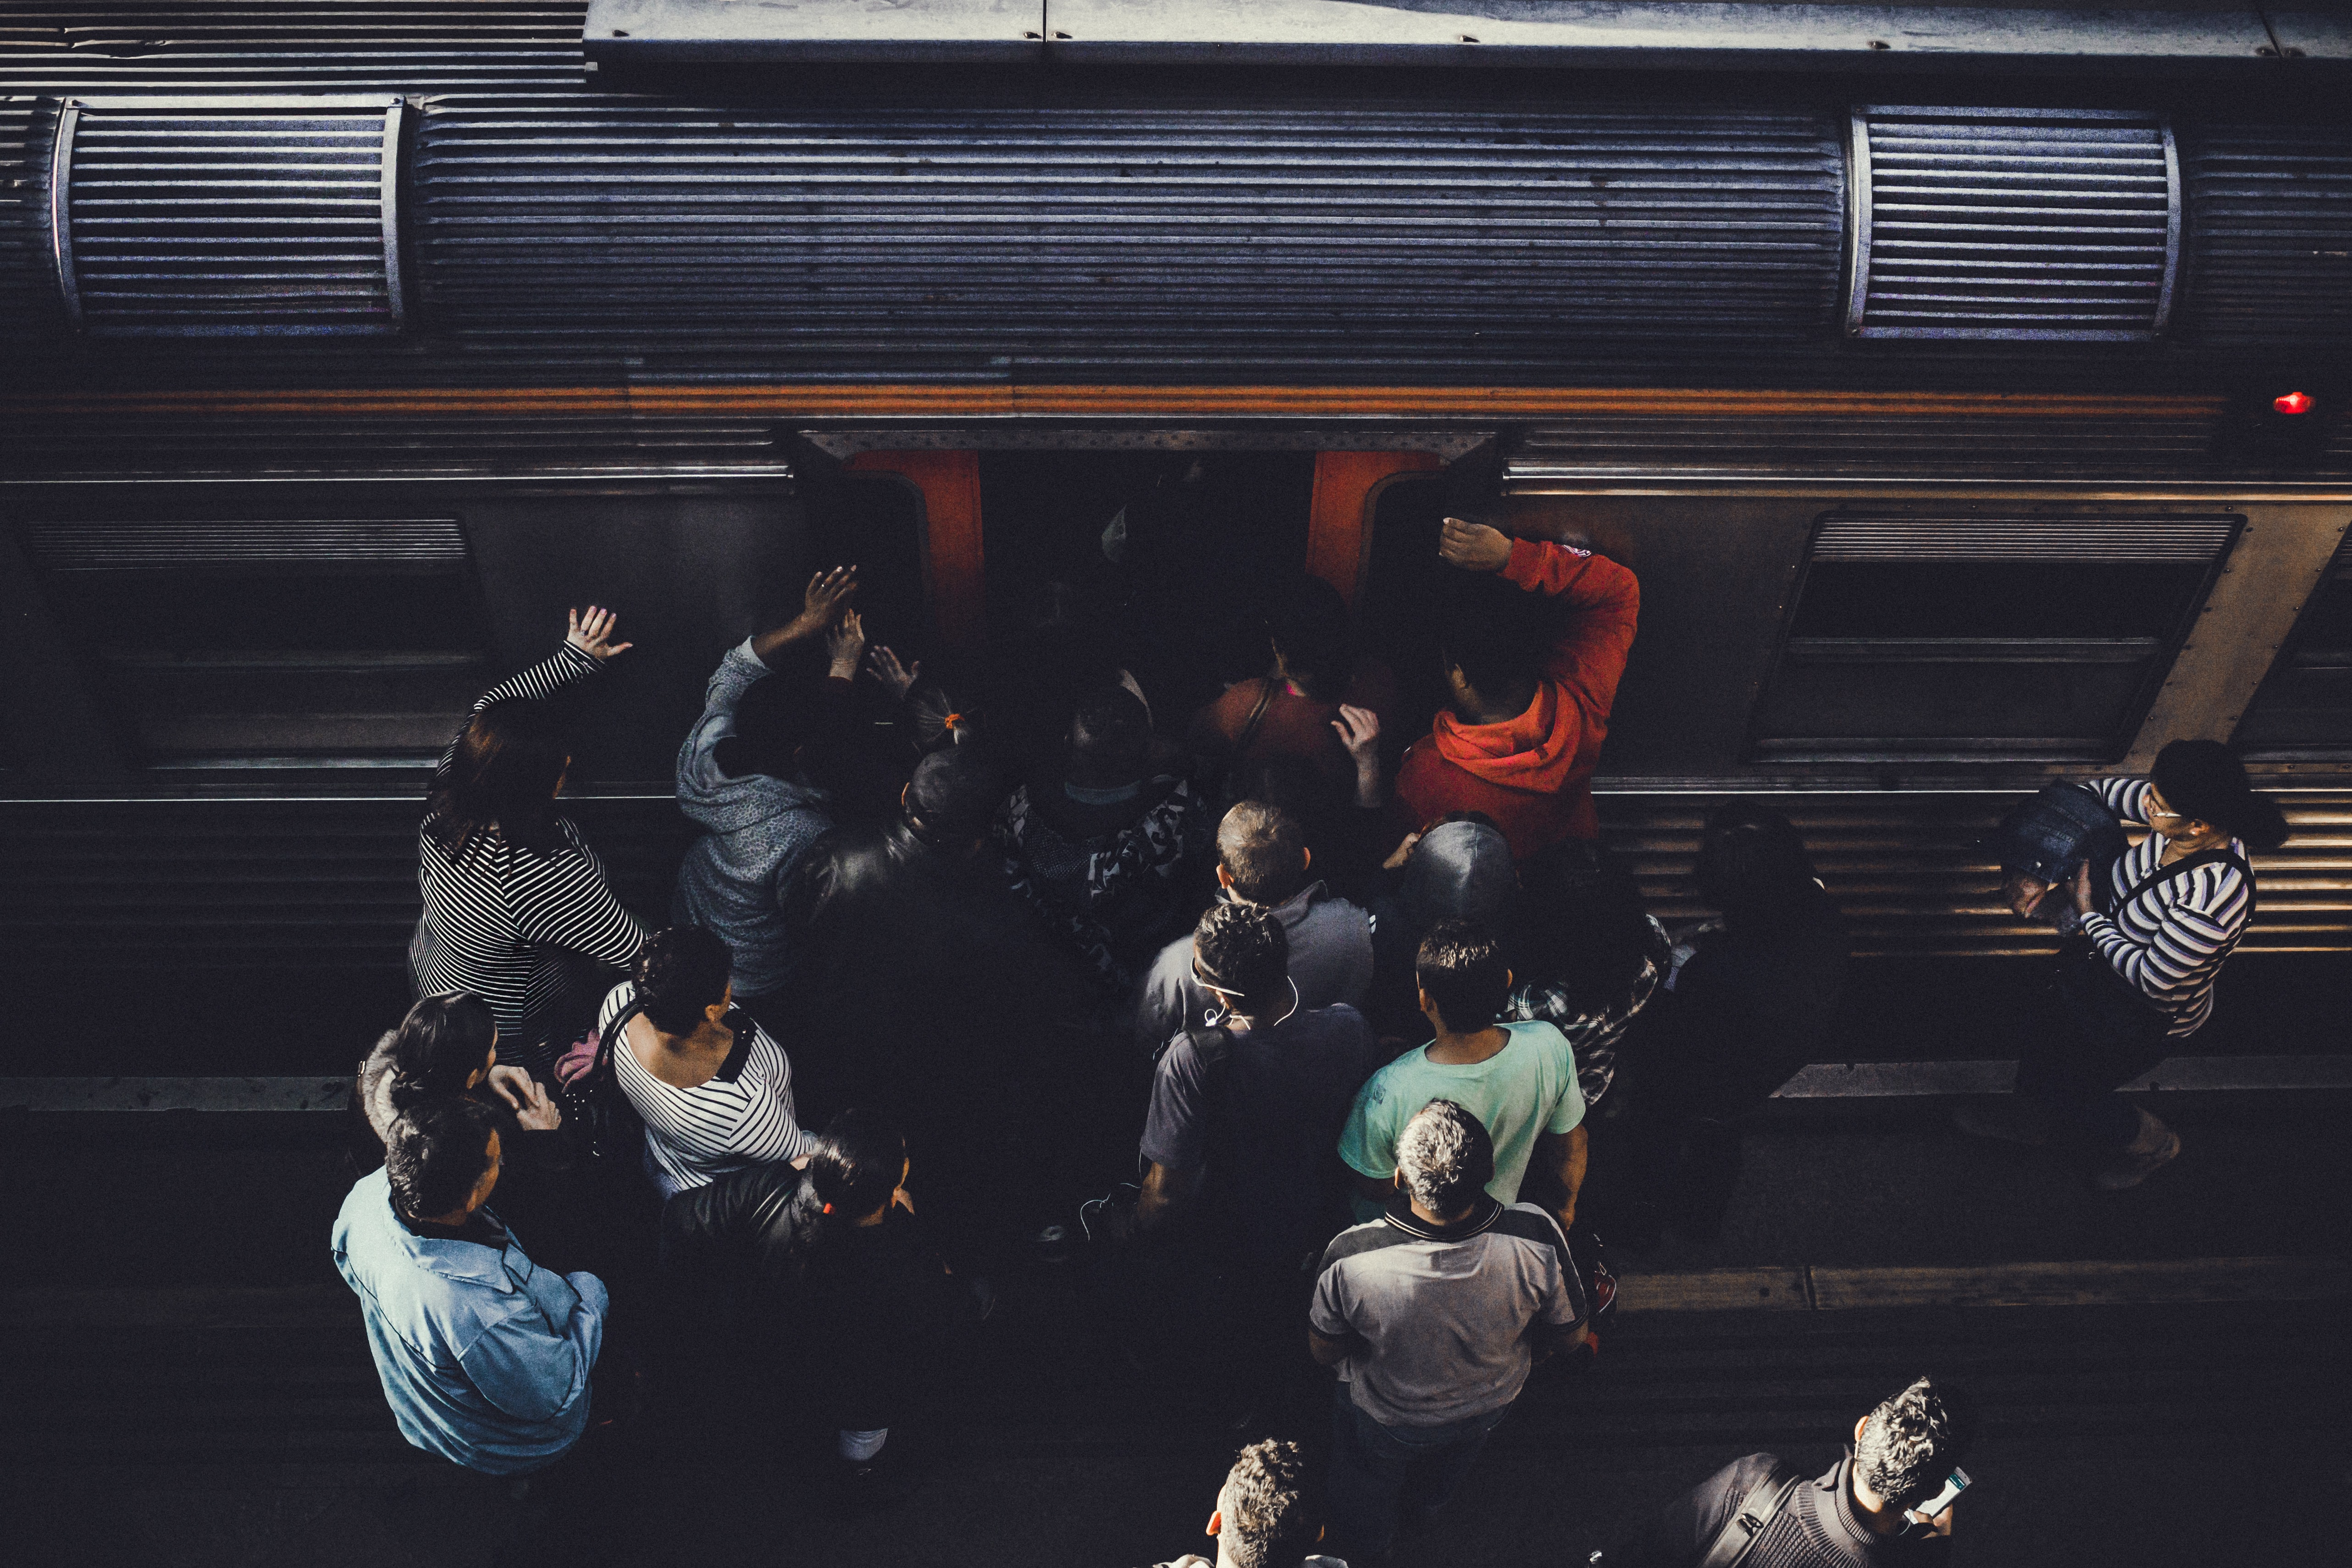 people entering train